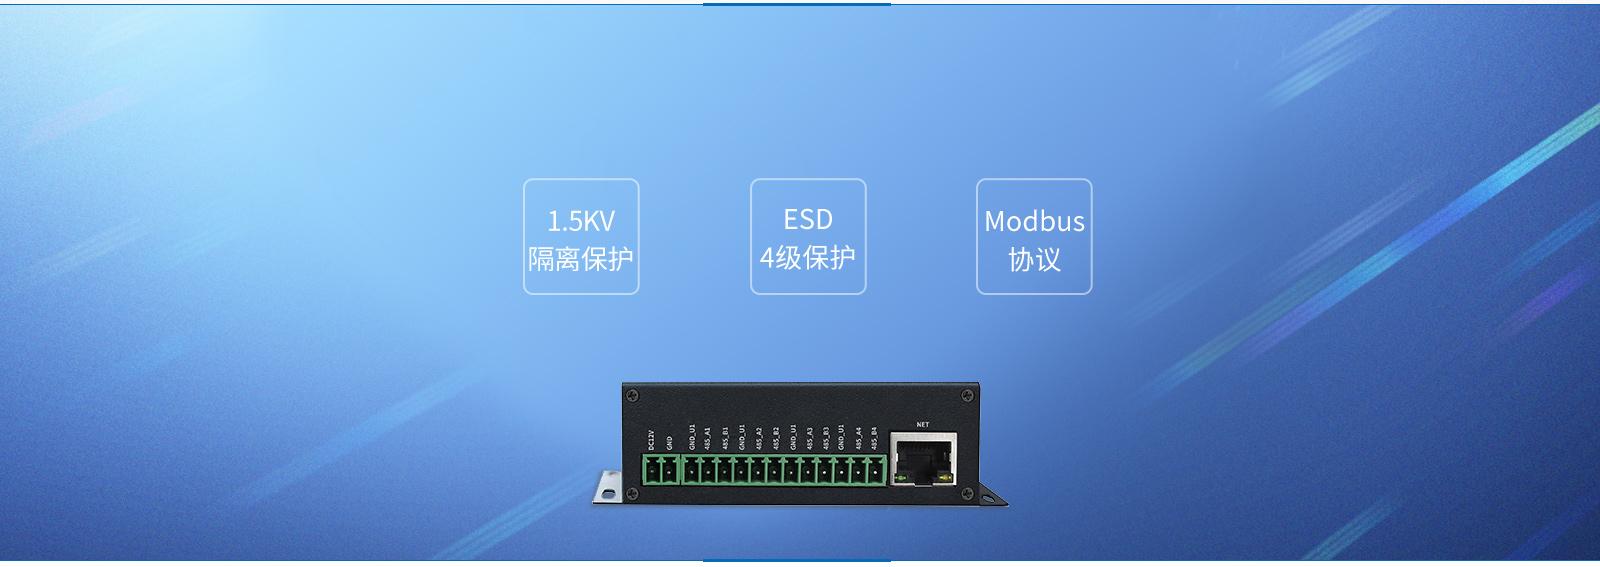 gong襠i?馗鬺i保护RS485接kou支持modbus协议